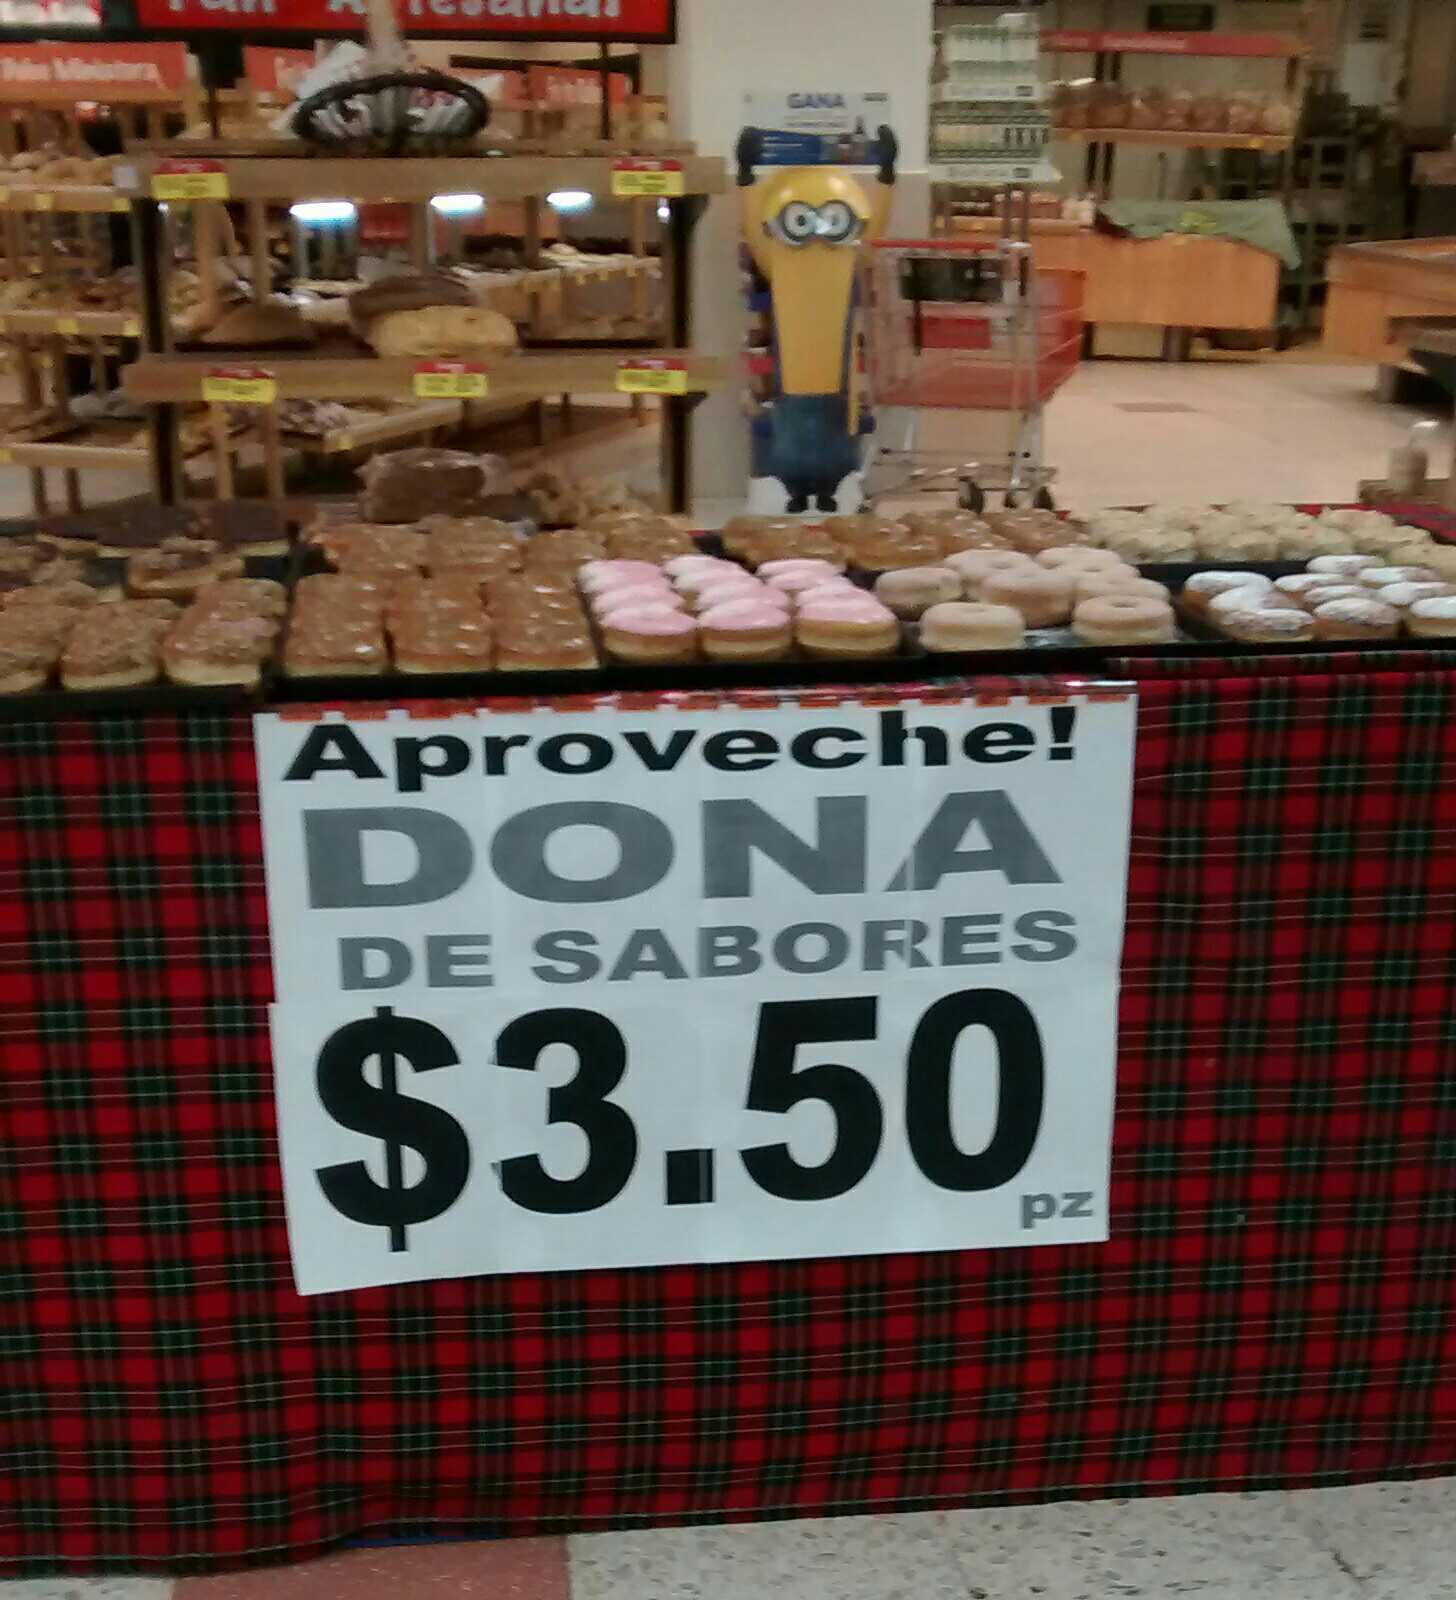 Soriana: donas a $3.50